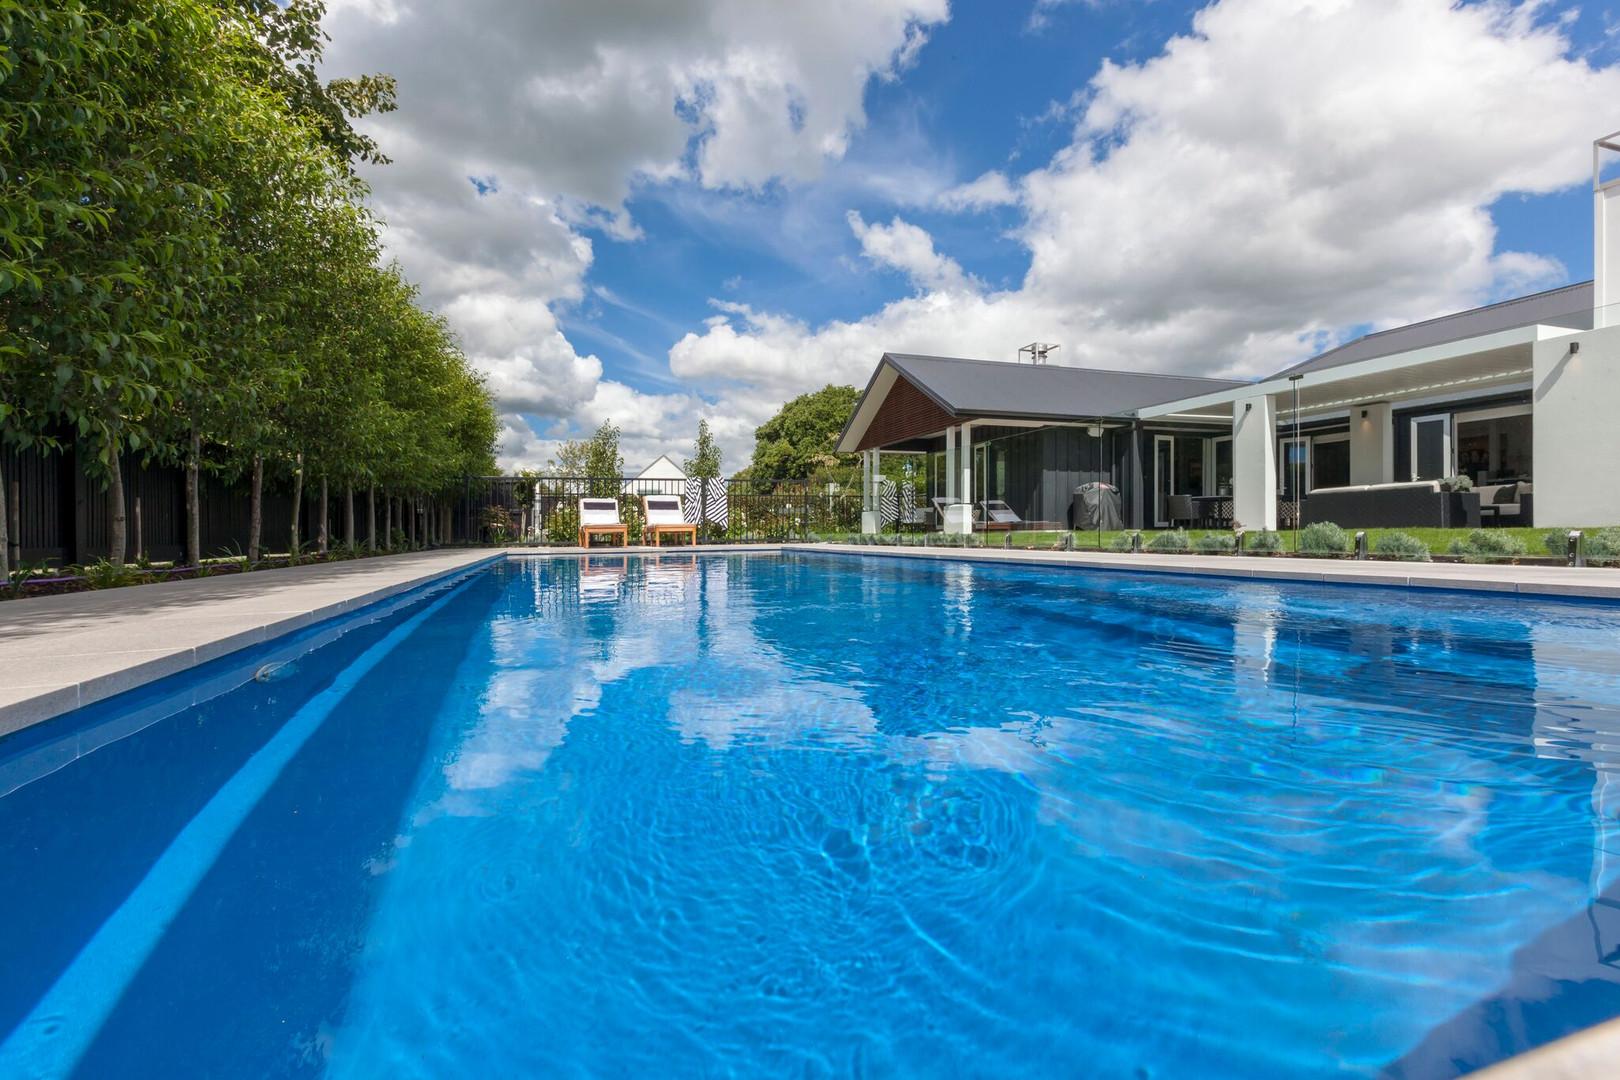 Lodge style home & pool